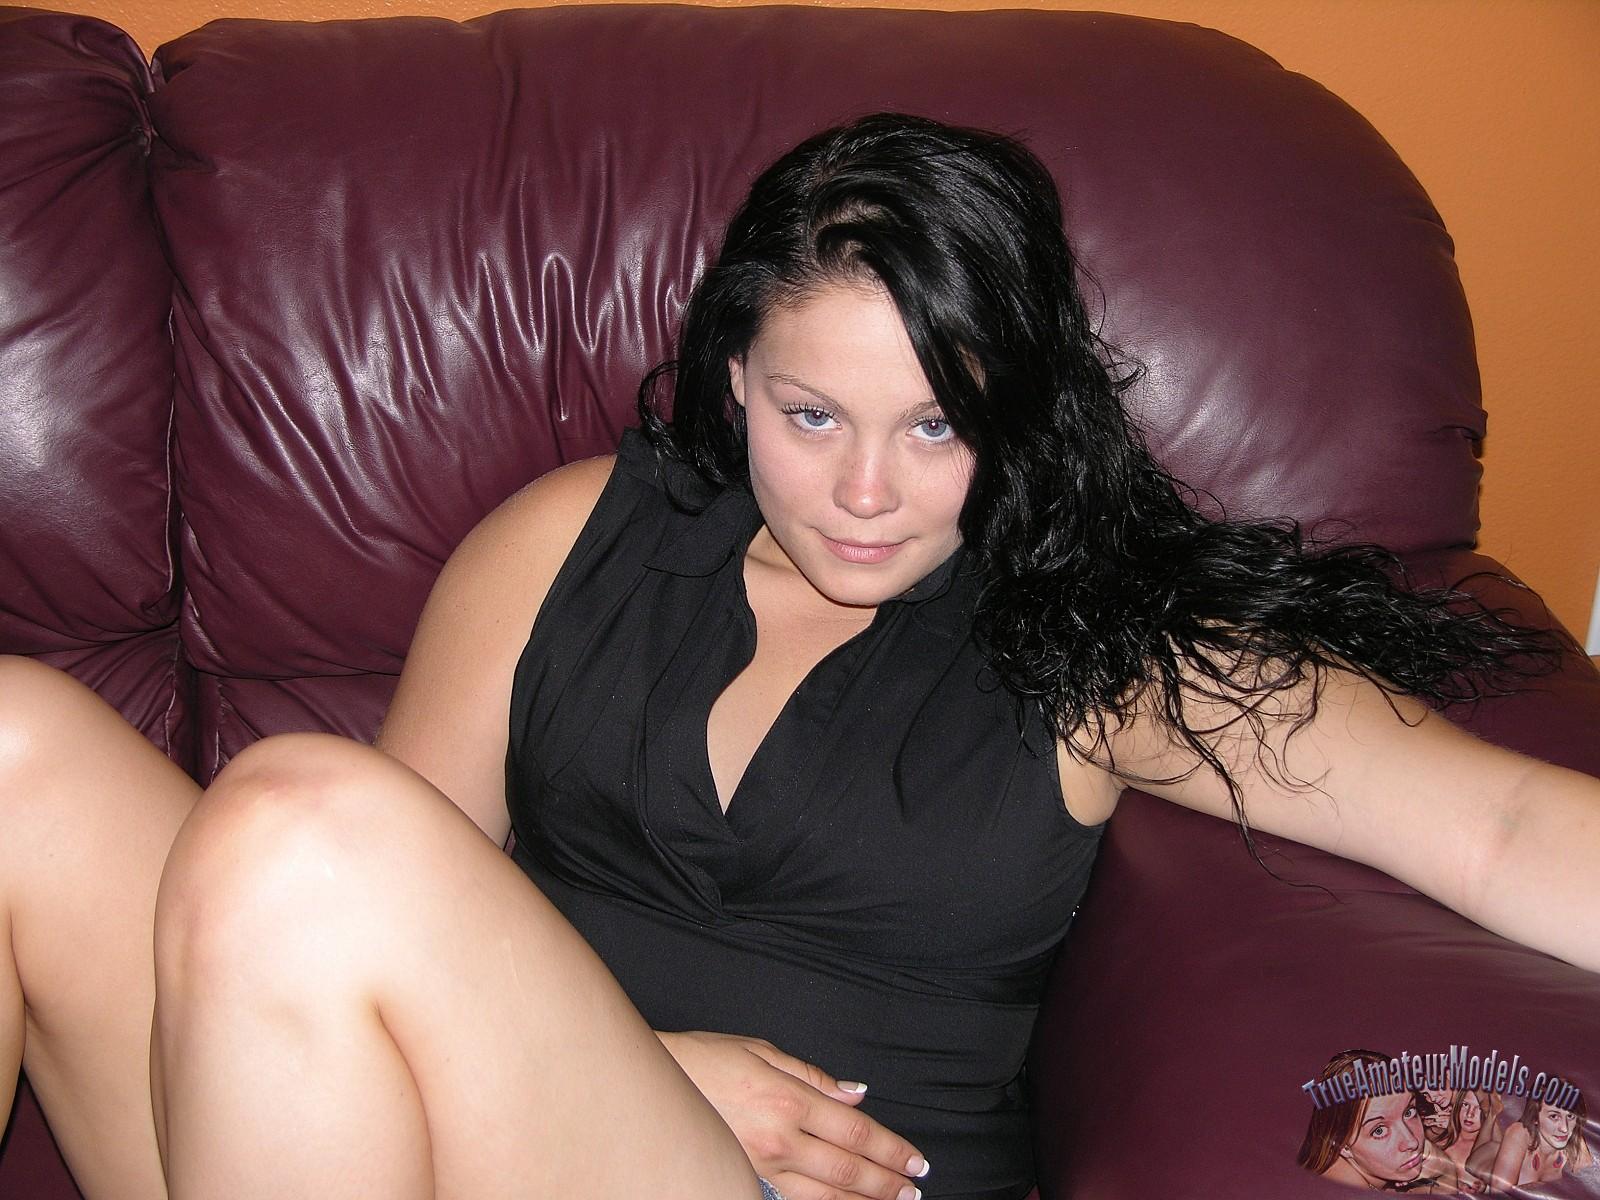 Fat naked girls tasha, erotic naked homosex of male